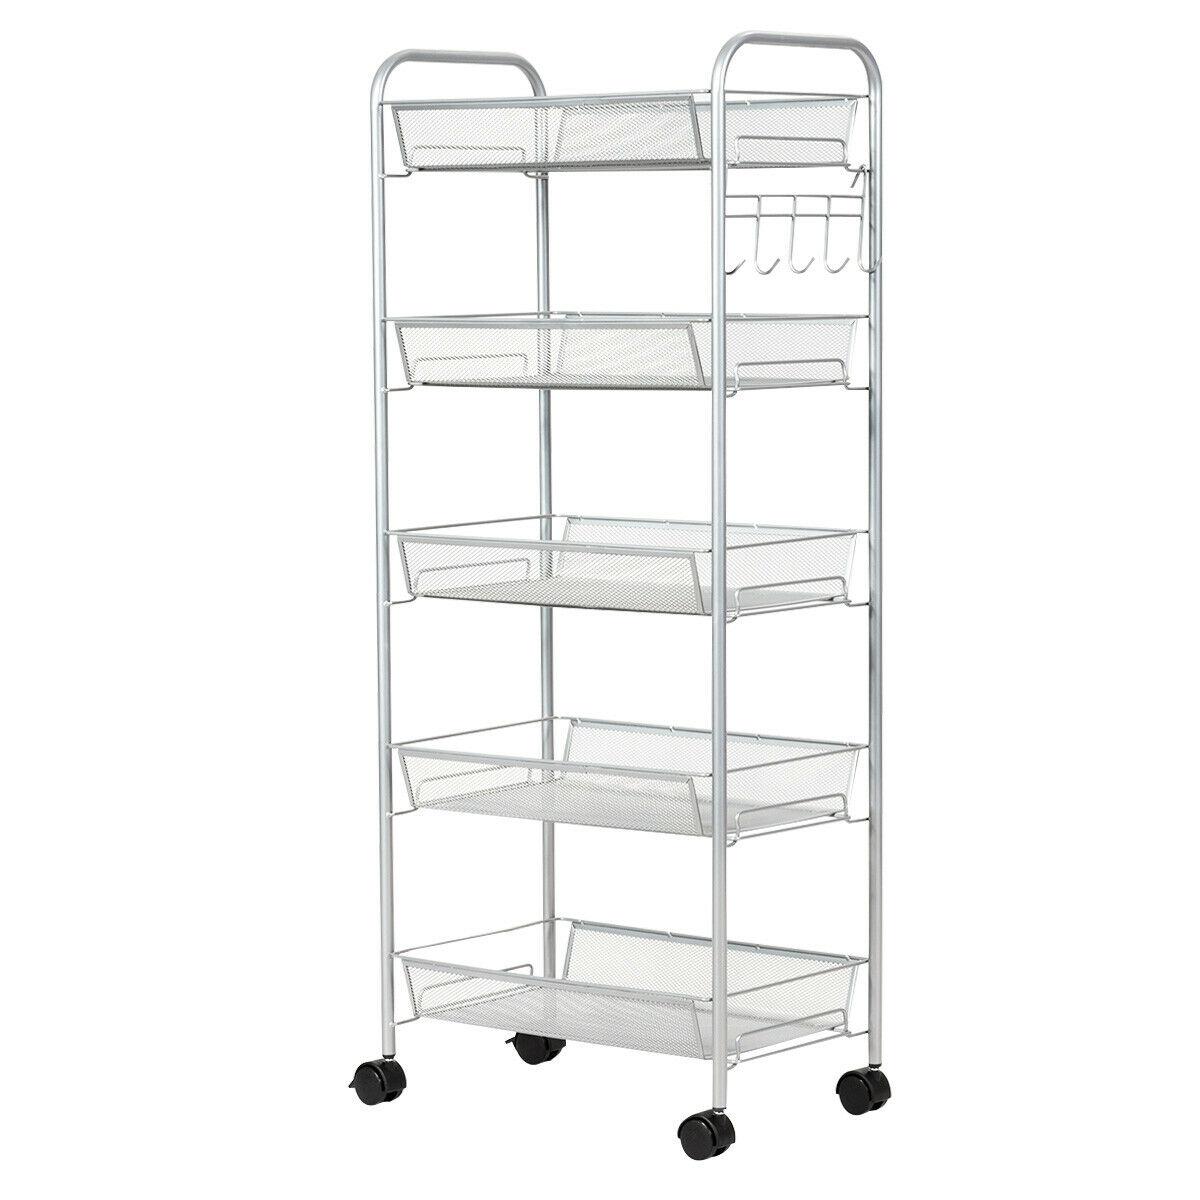 5 Tier Mesh Rolling File Utility Cart Storage Basket